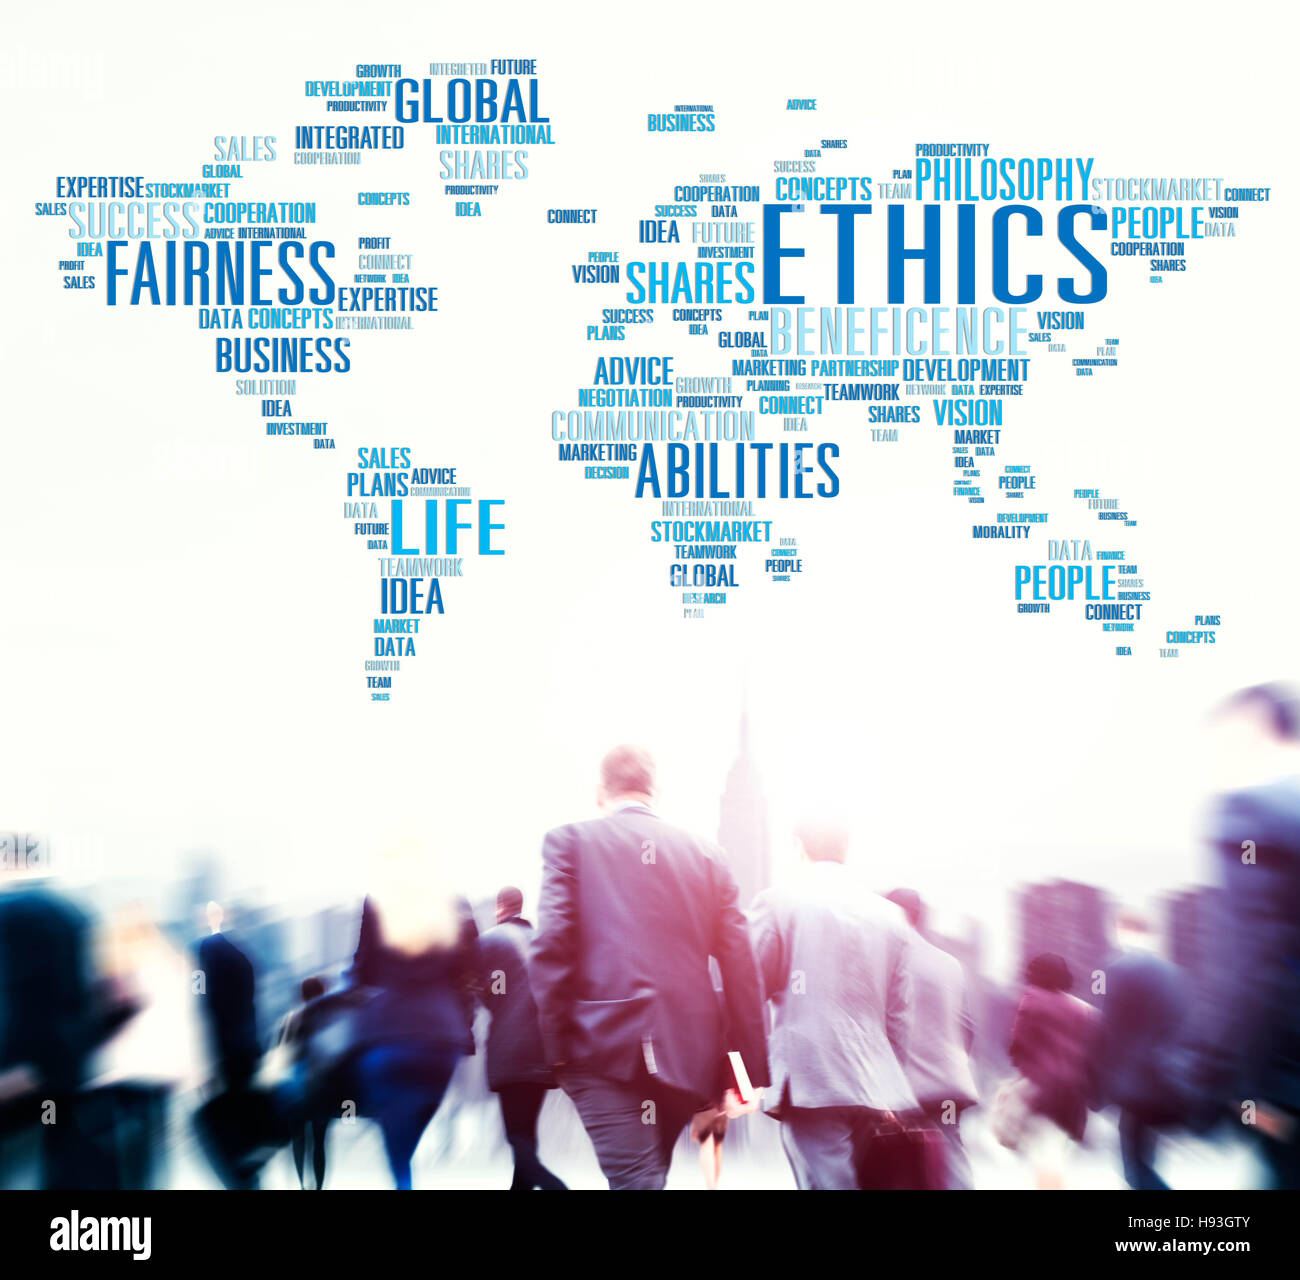 Ethics Ideals Principles Morals Standards Concept - Stock Image